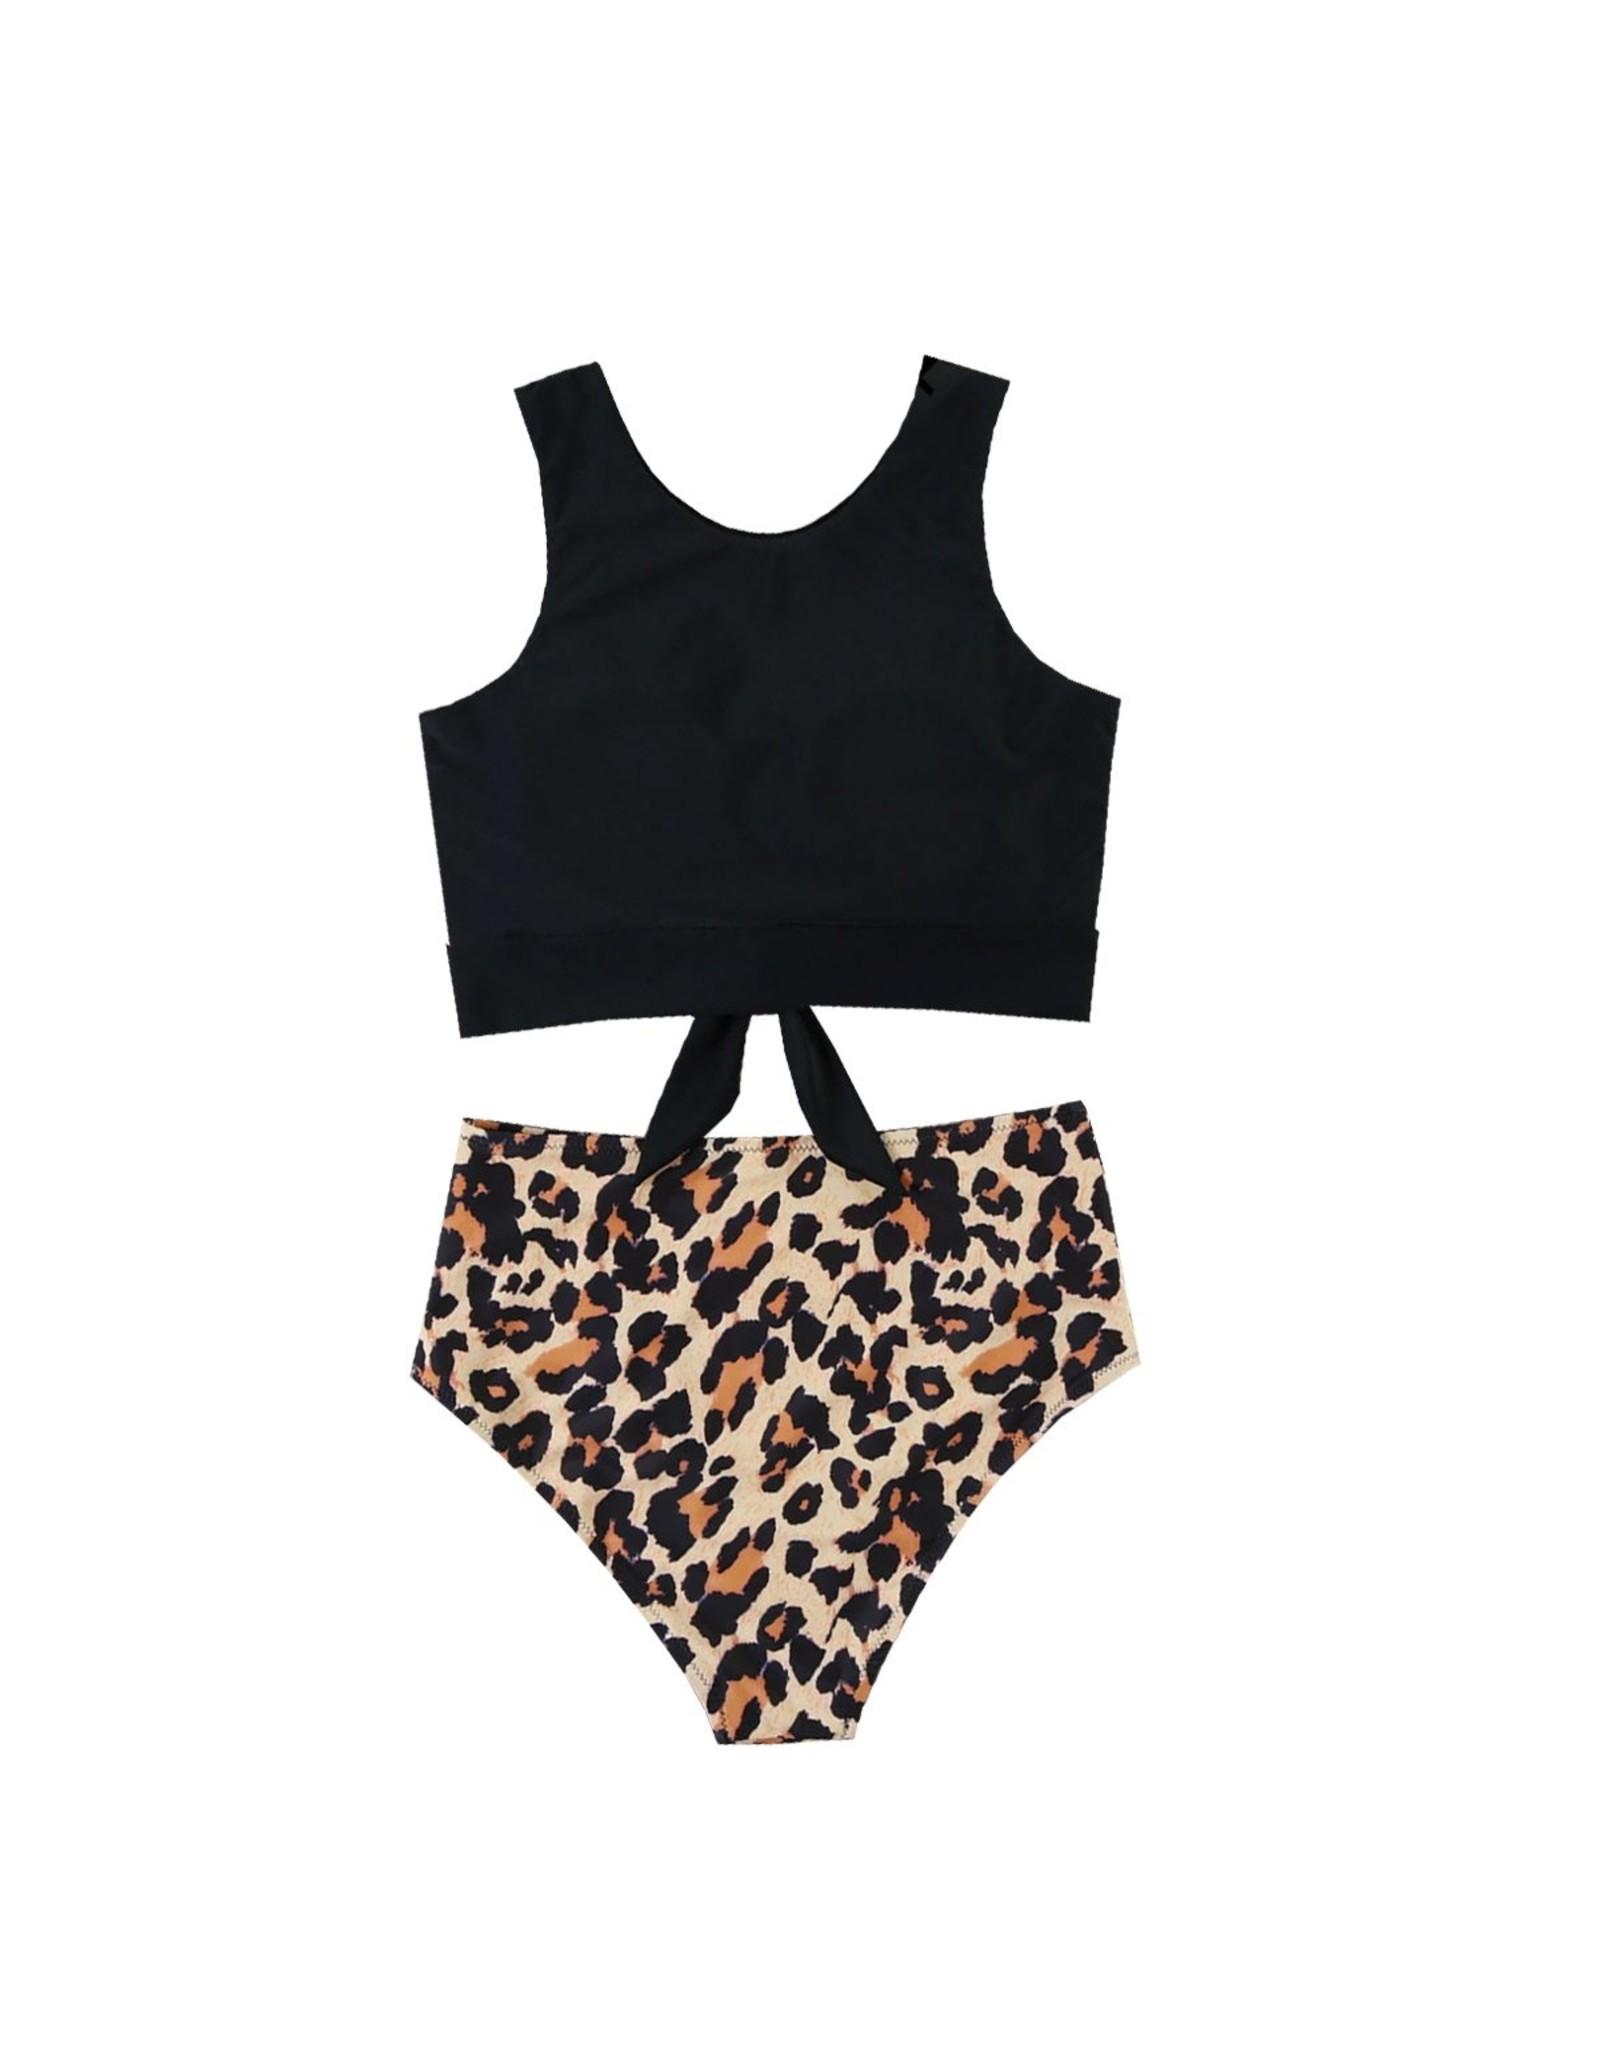 Shady Lady Swimwear - Huntington Beach Swimsuit